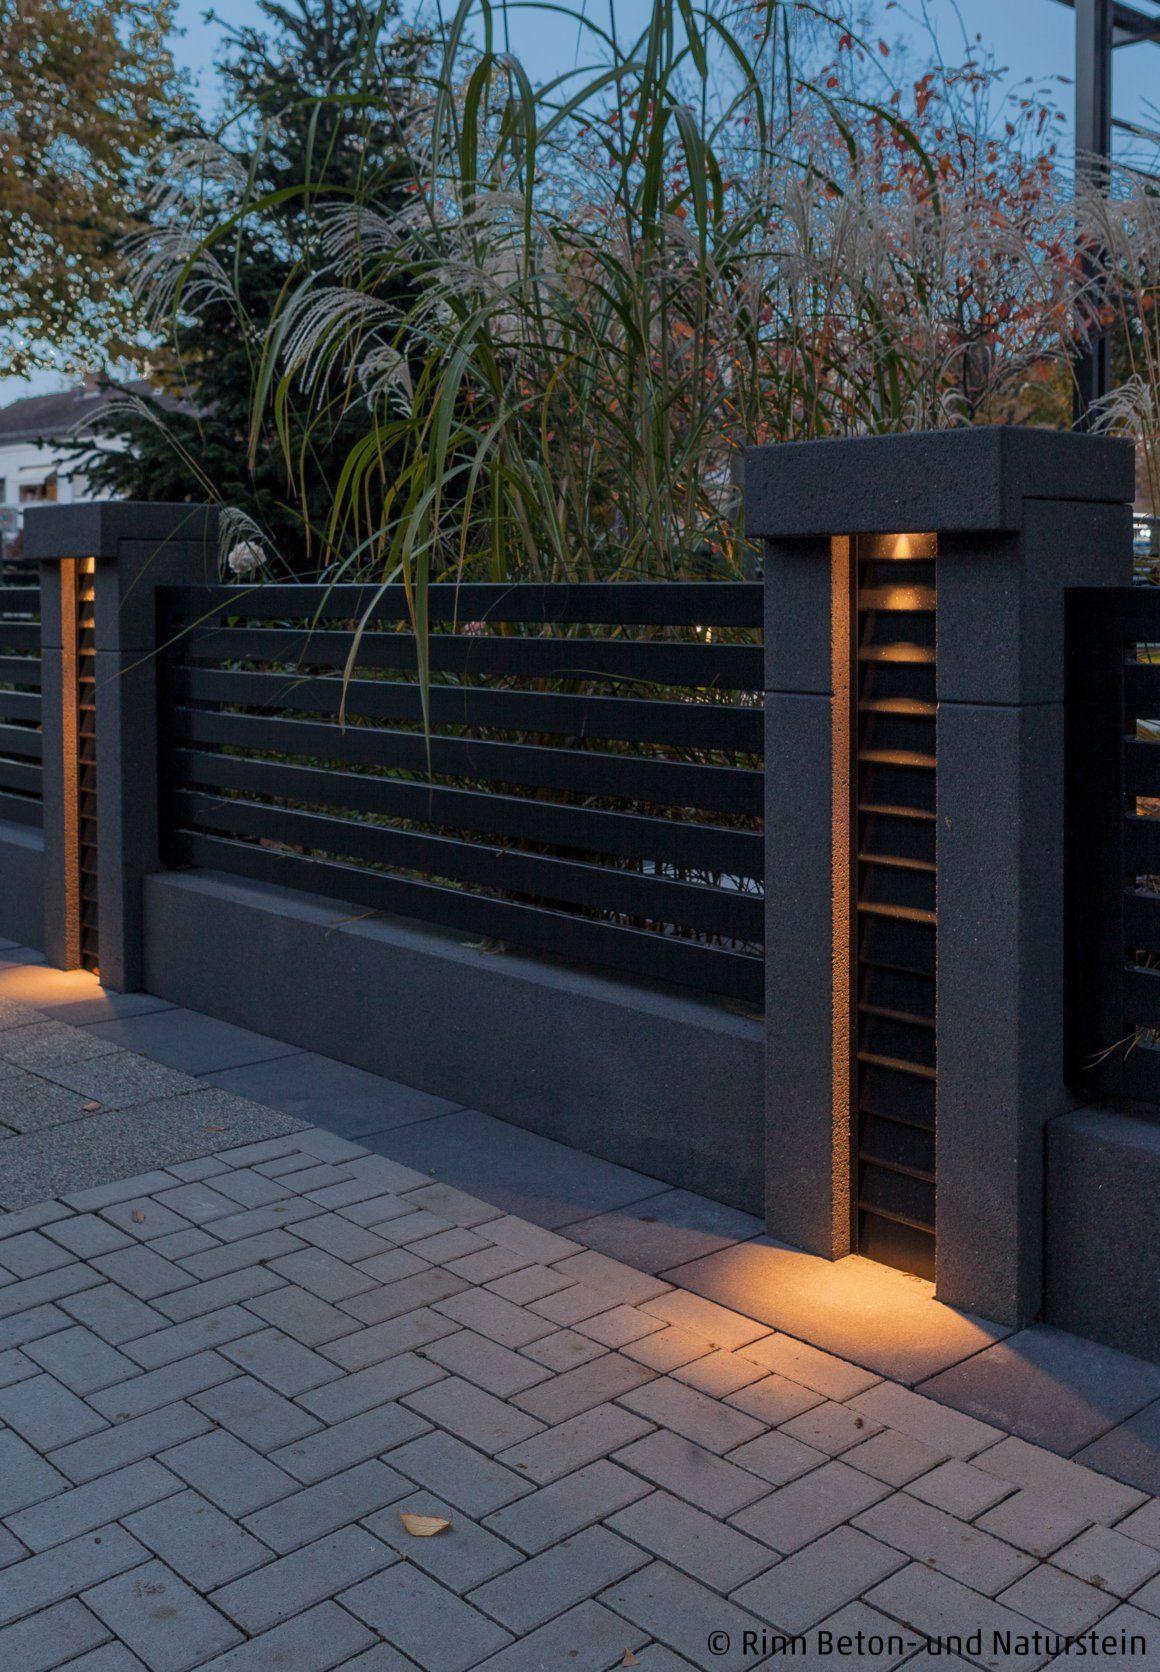 30 Modern Fence Design Ideas Engineering Discoveries In 2021 House Fence Design Modern Fence Design House Gate Design